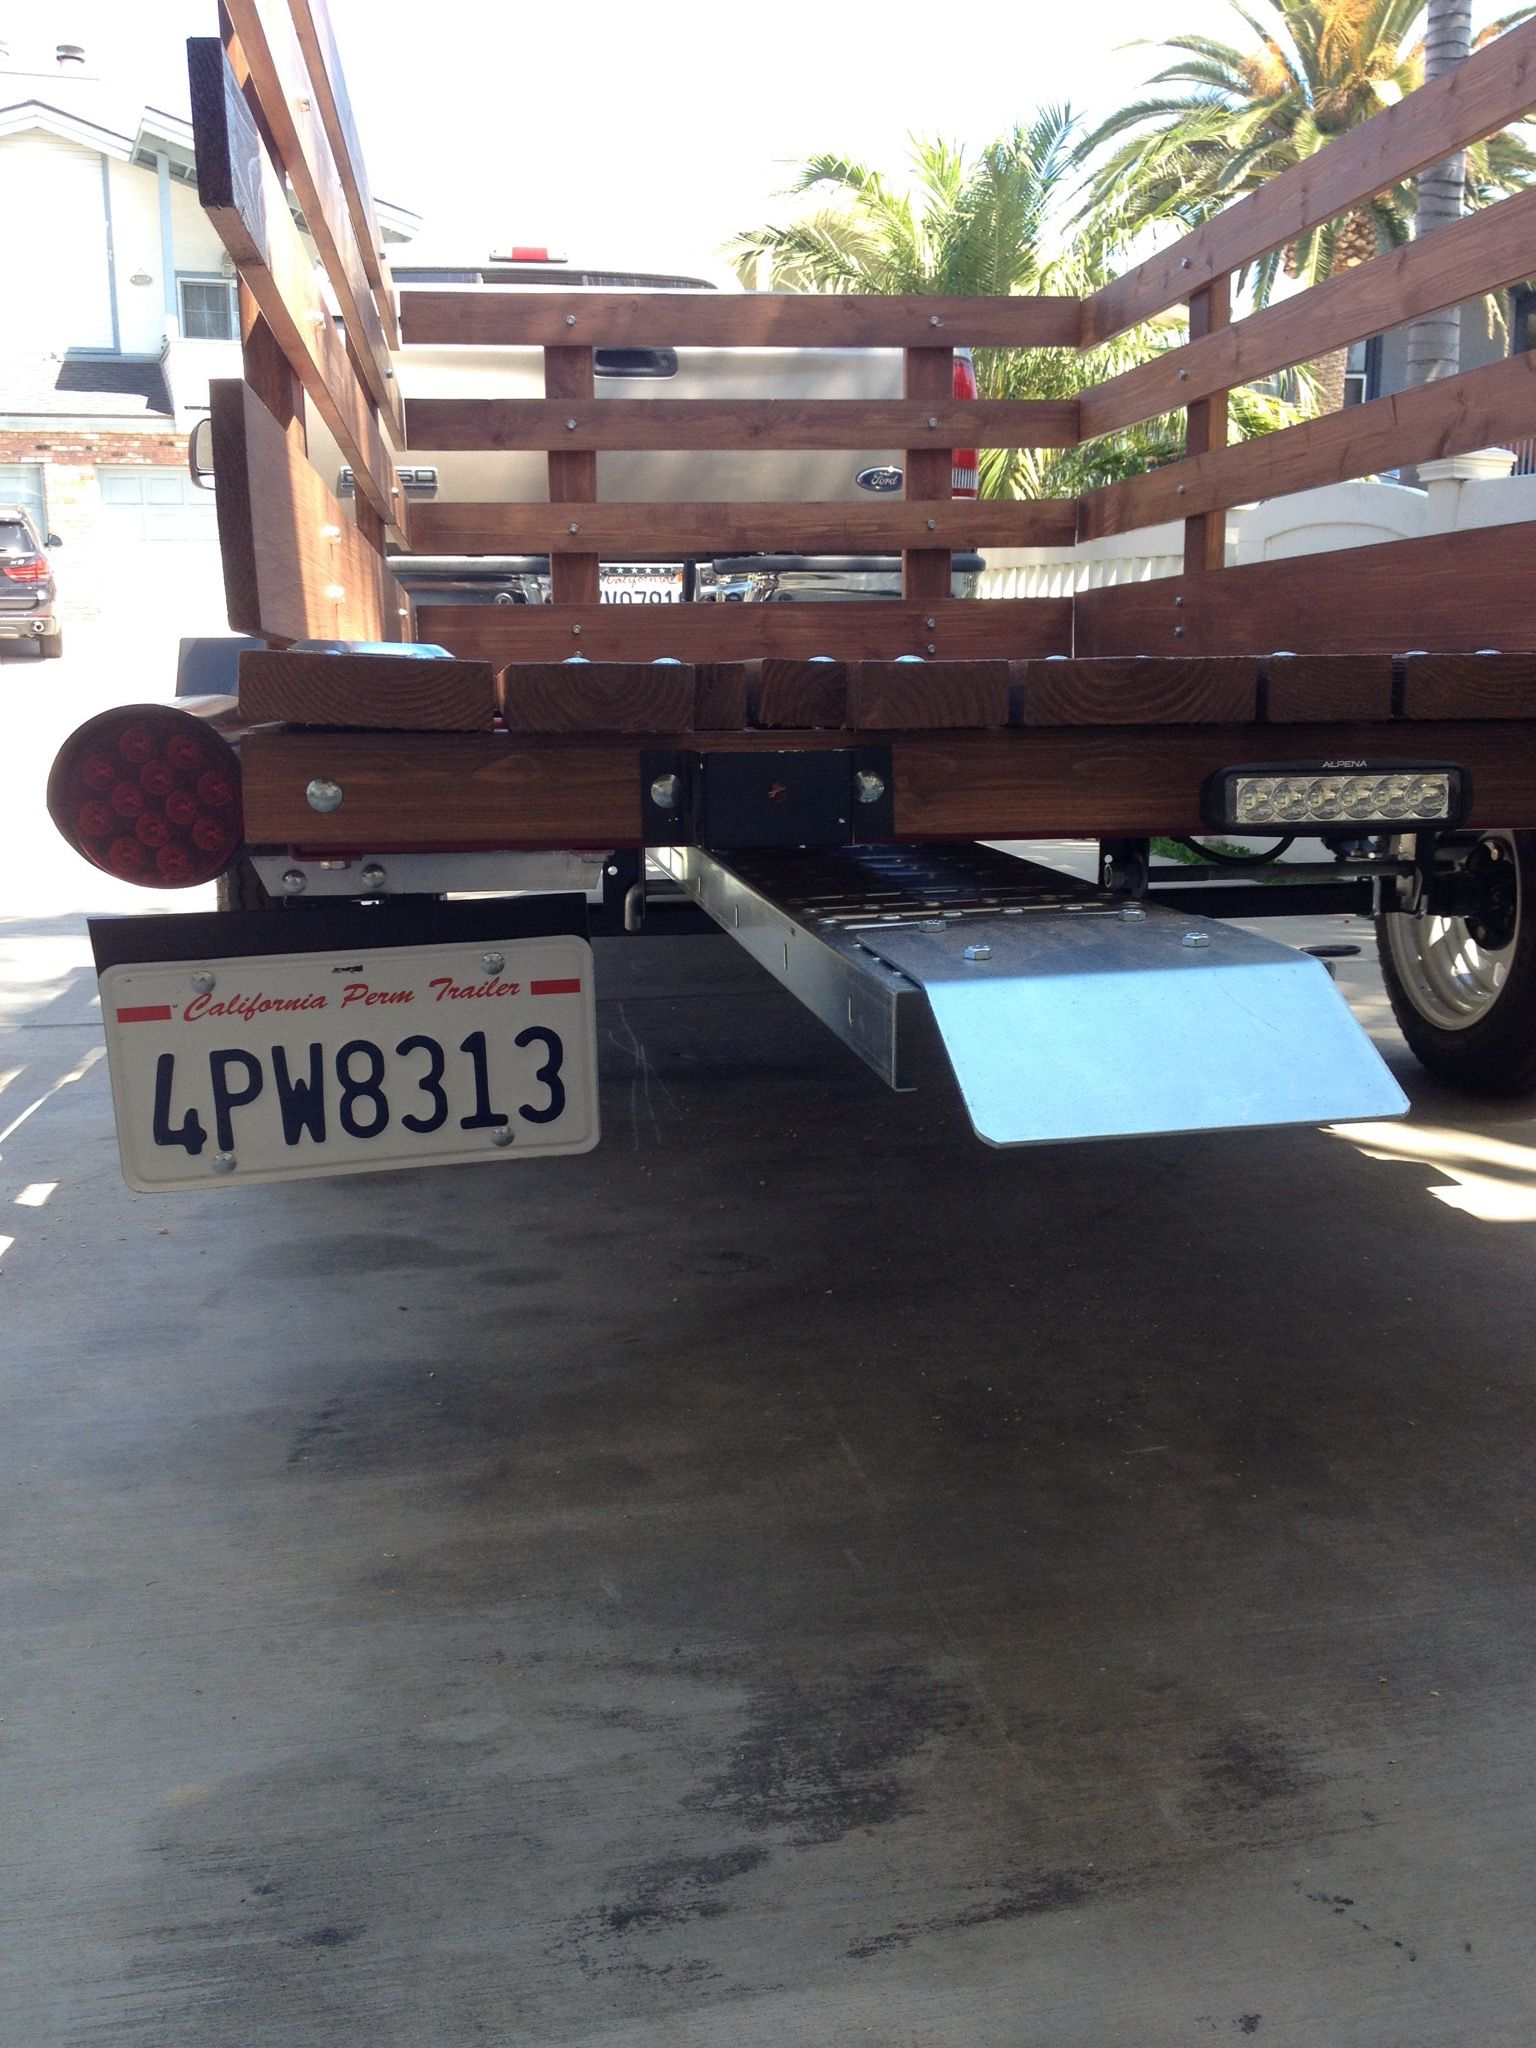 Utility Trailer for Sale (So Cal Orange County Craigslist ...